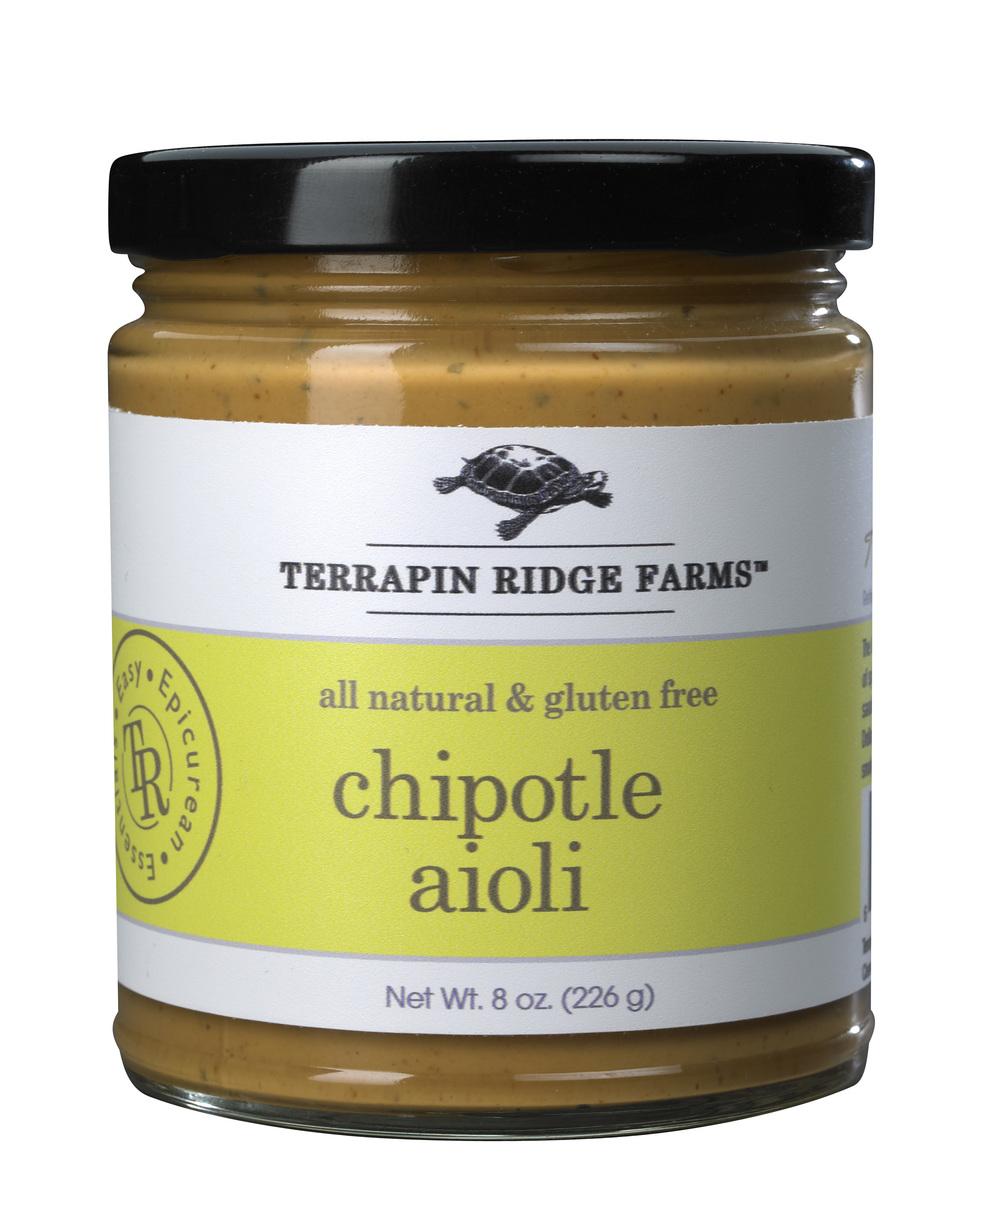 TERRAPIN RIDGE FARMS: Chipotle Aioli